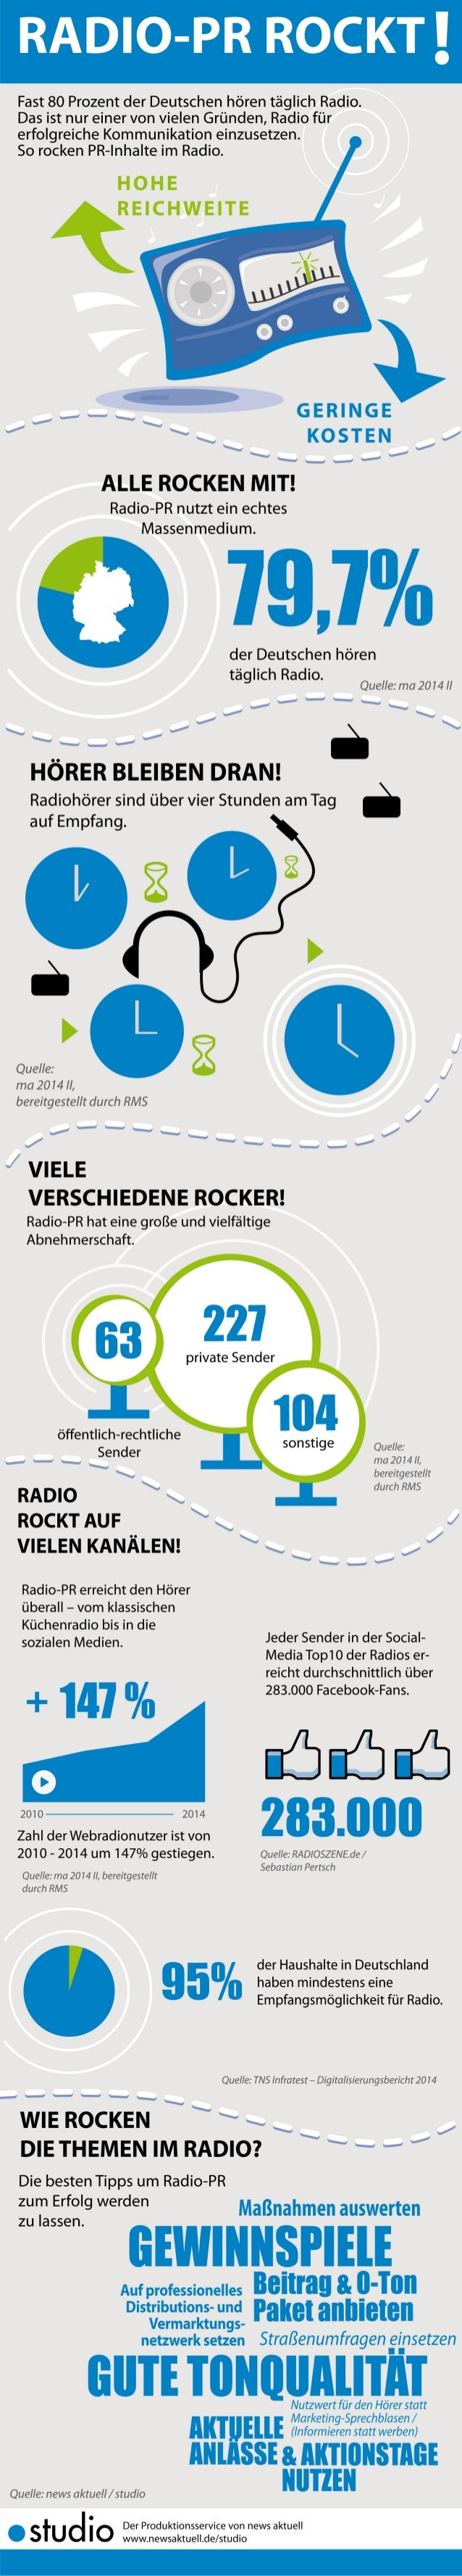 """Radio PR rockt!"""